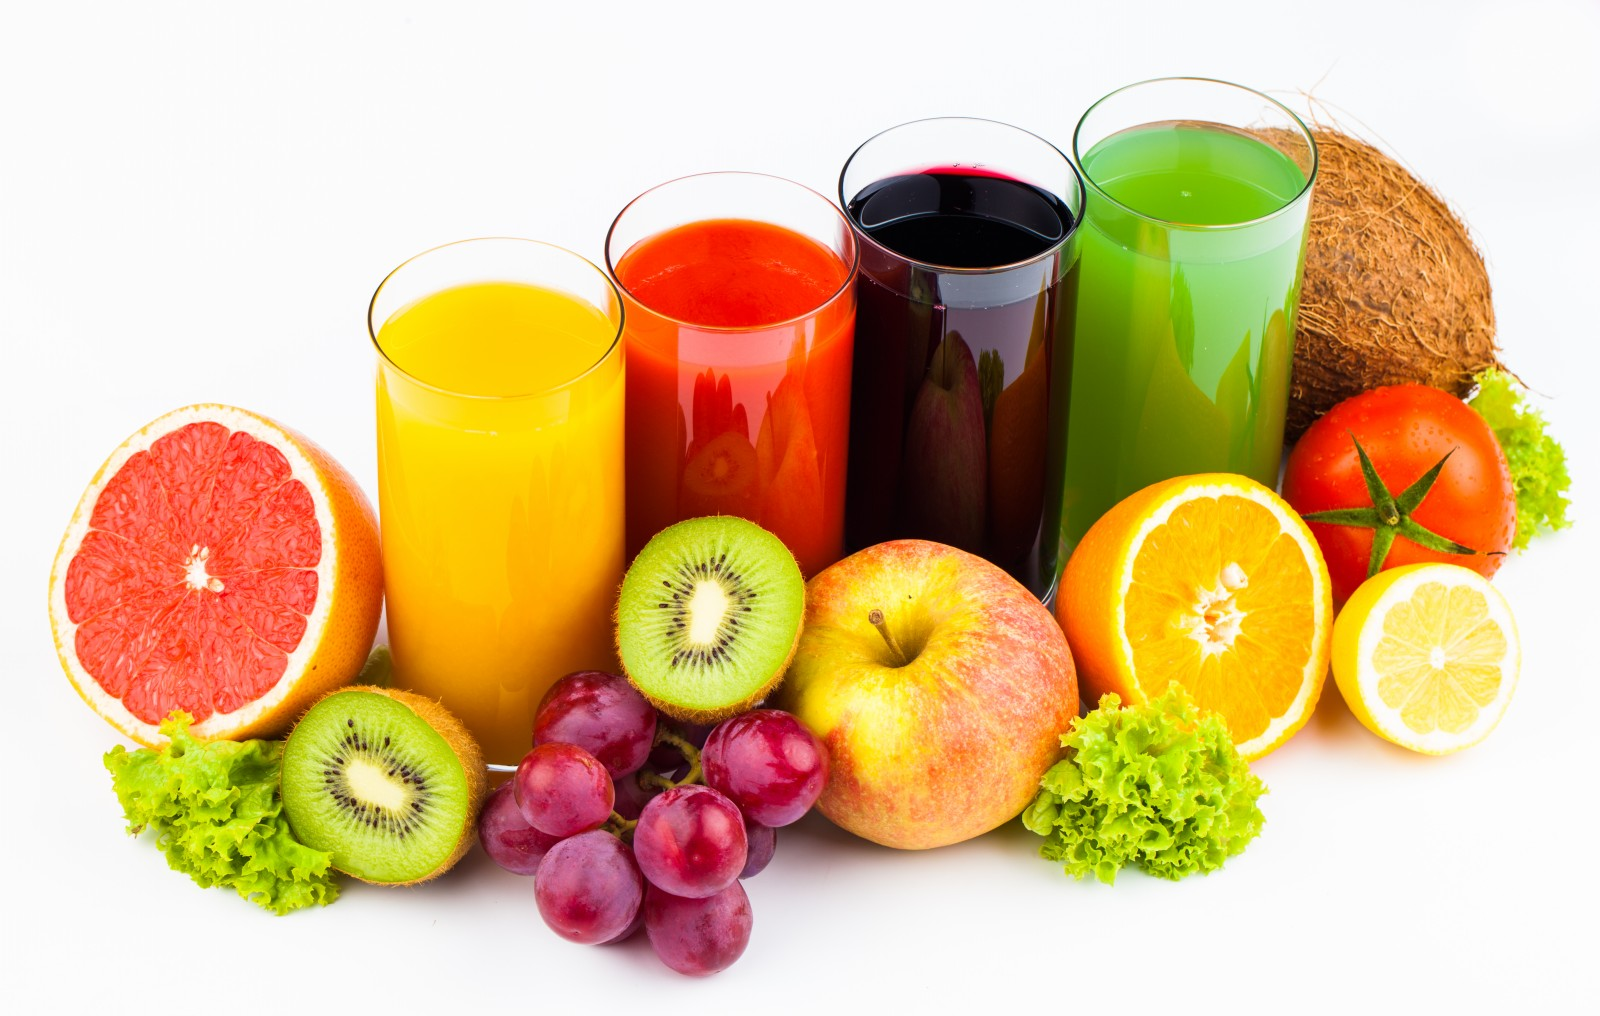 Foto: juiceproducer.com